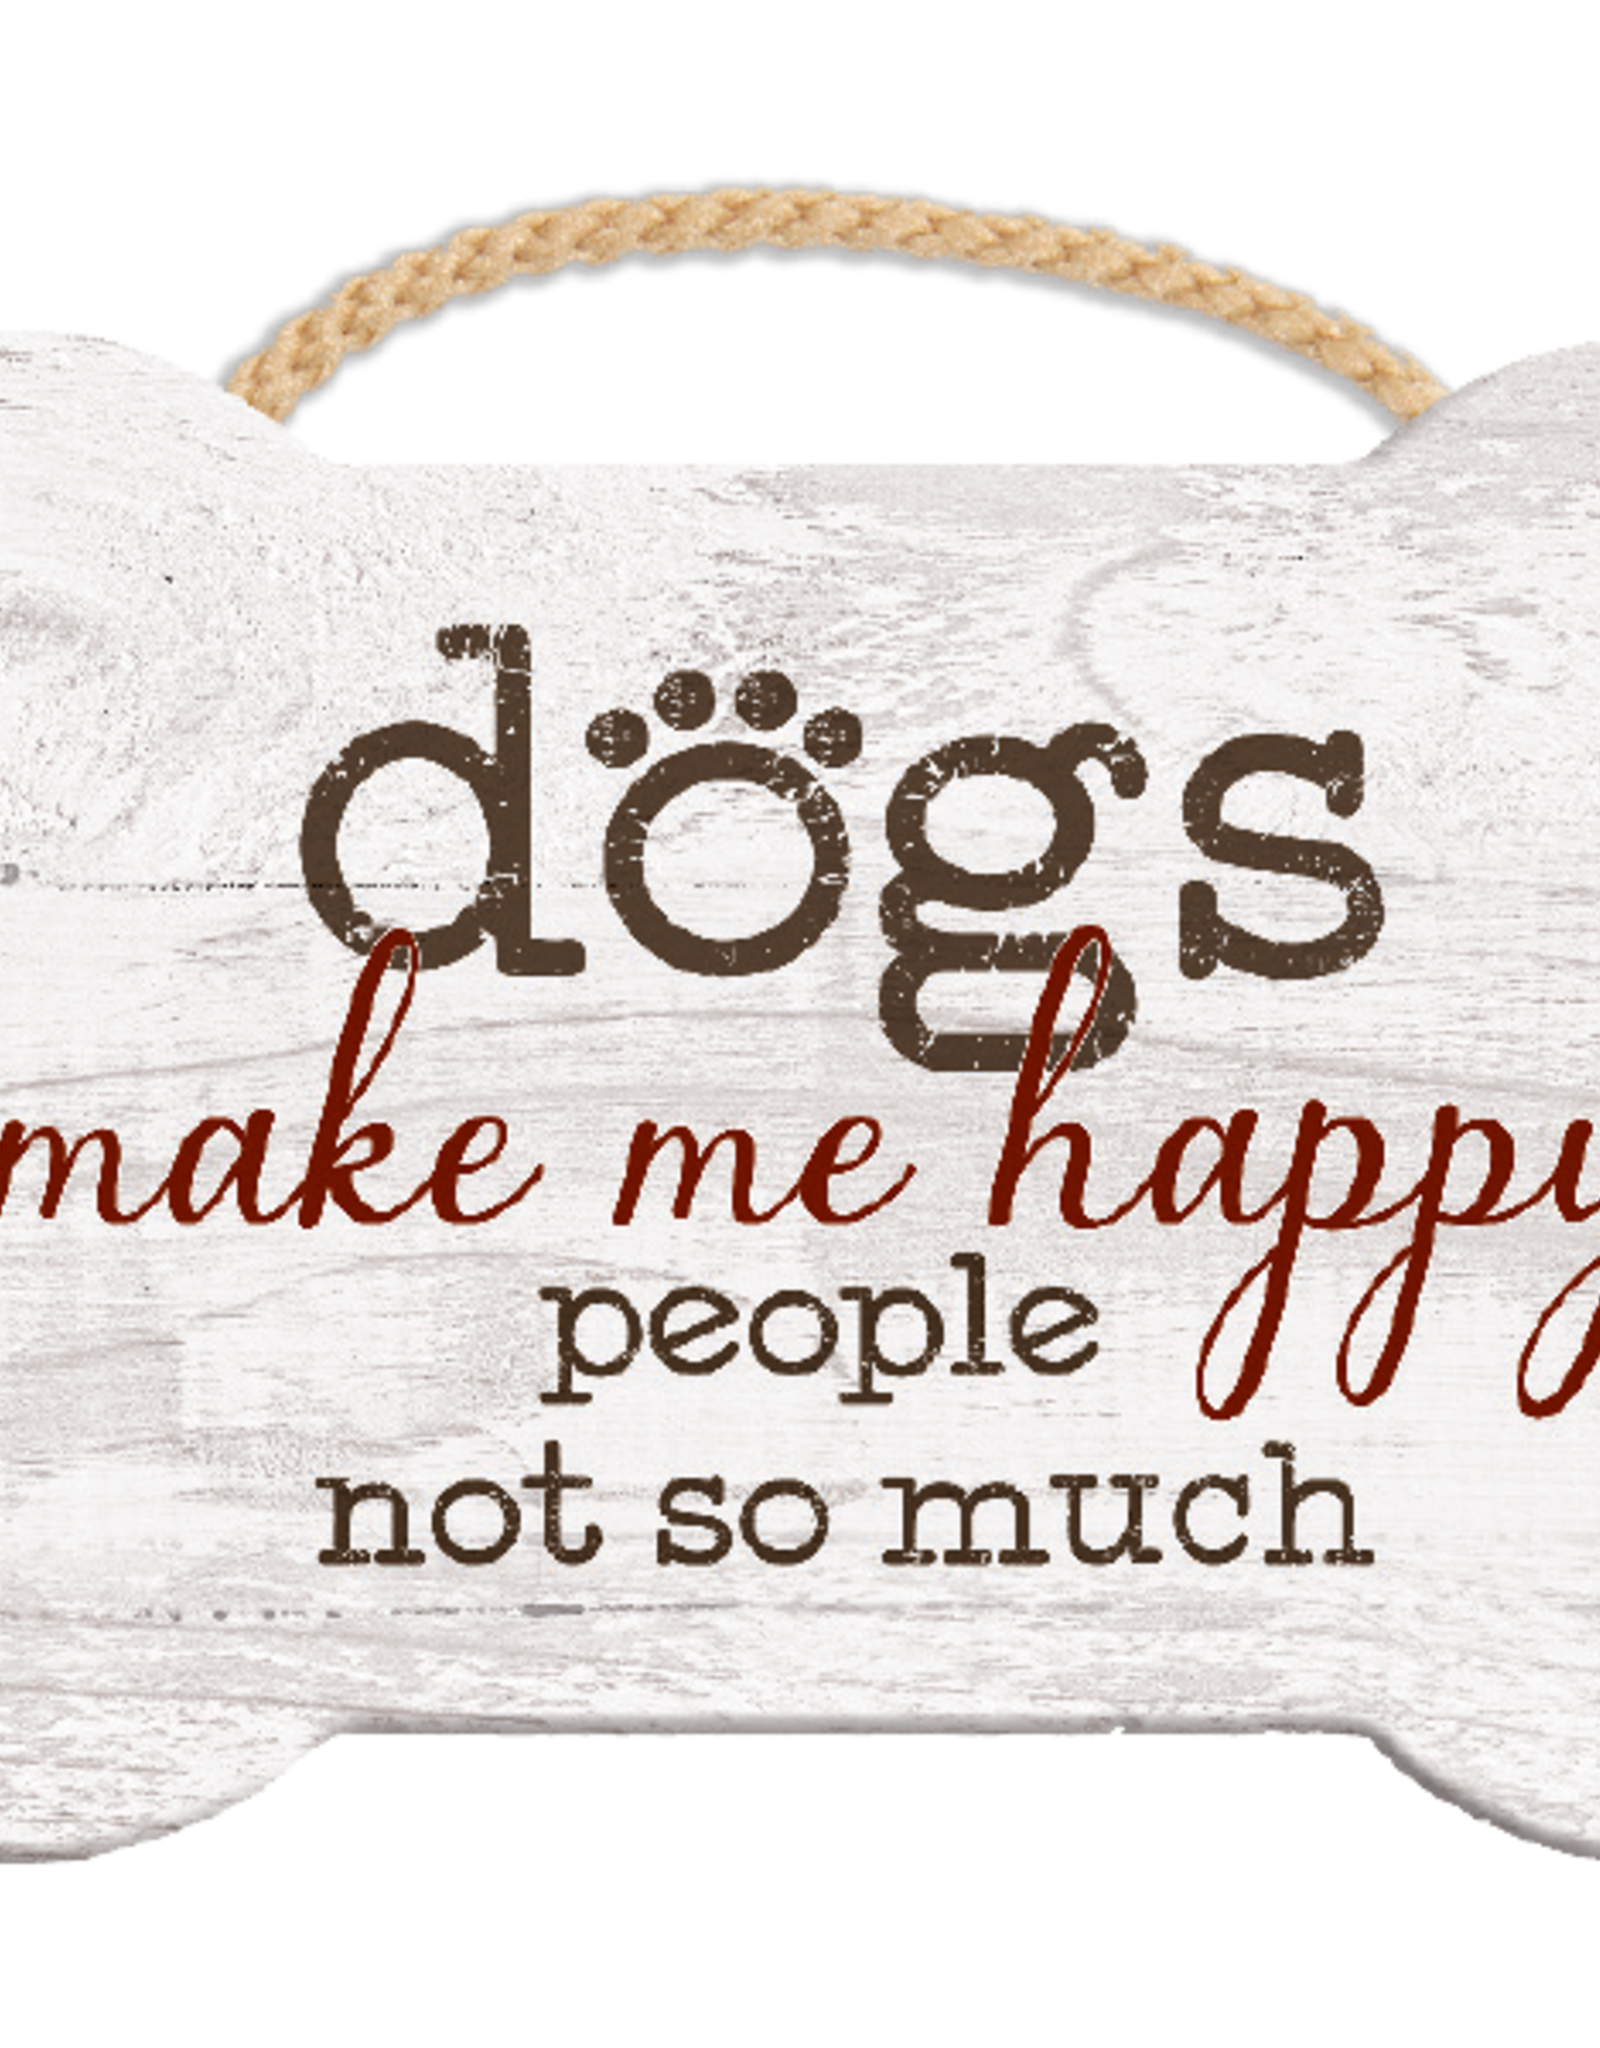 Dog Speak Dog Speak Rope Hanging Sign - Dogs Make Me Happy